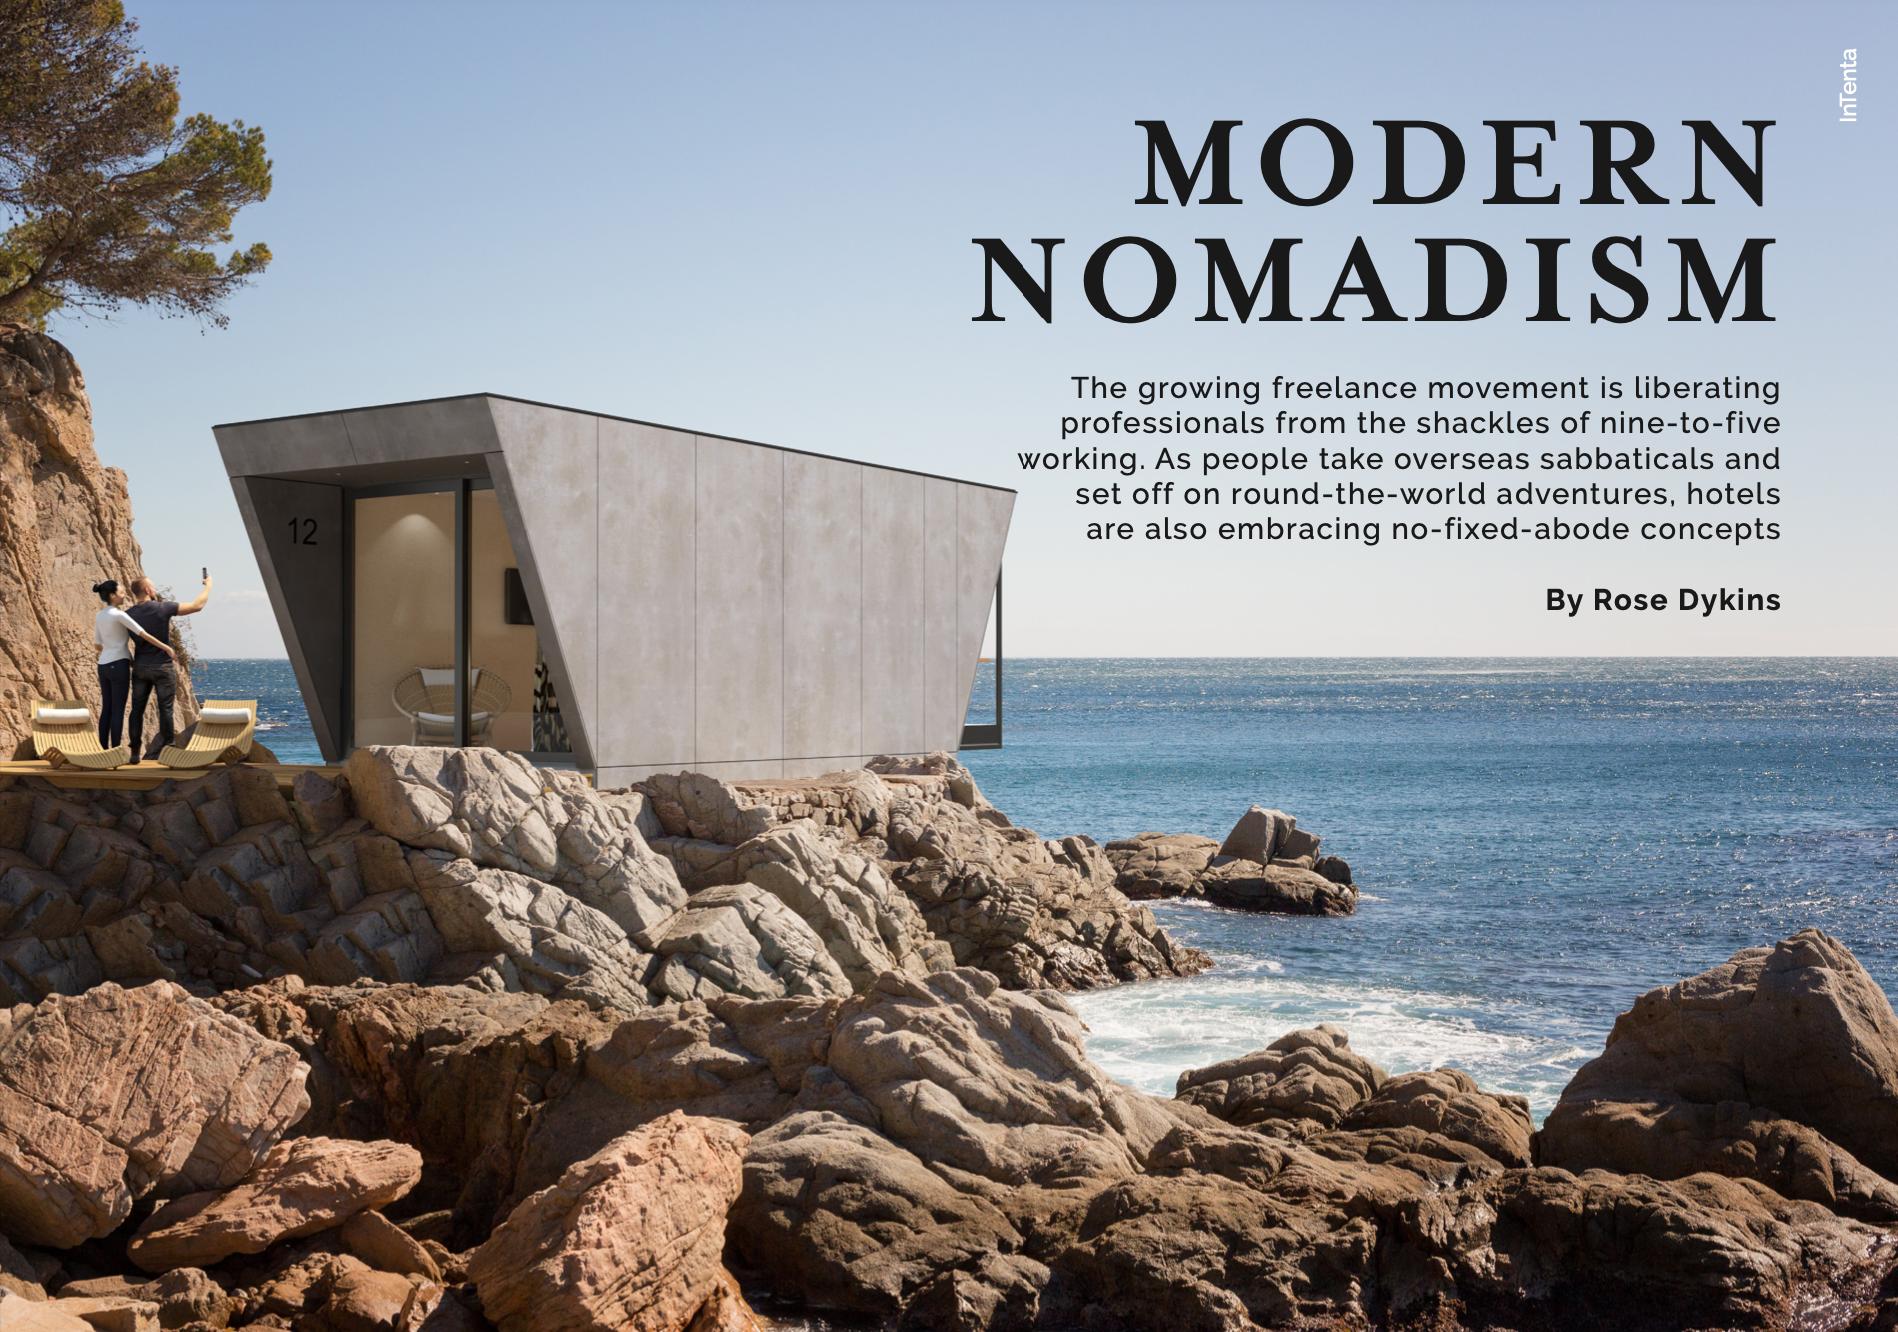 Modern Nomadism